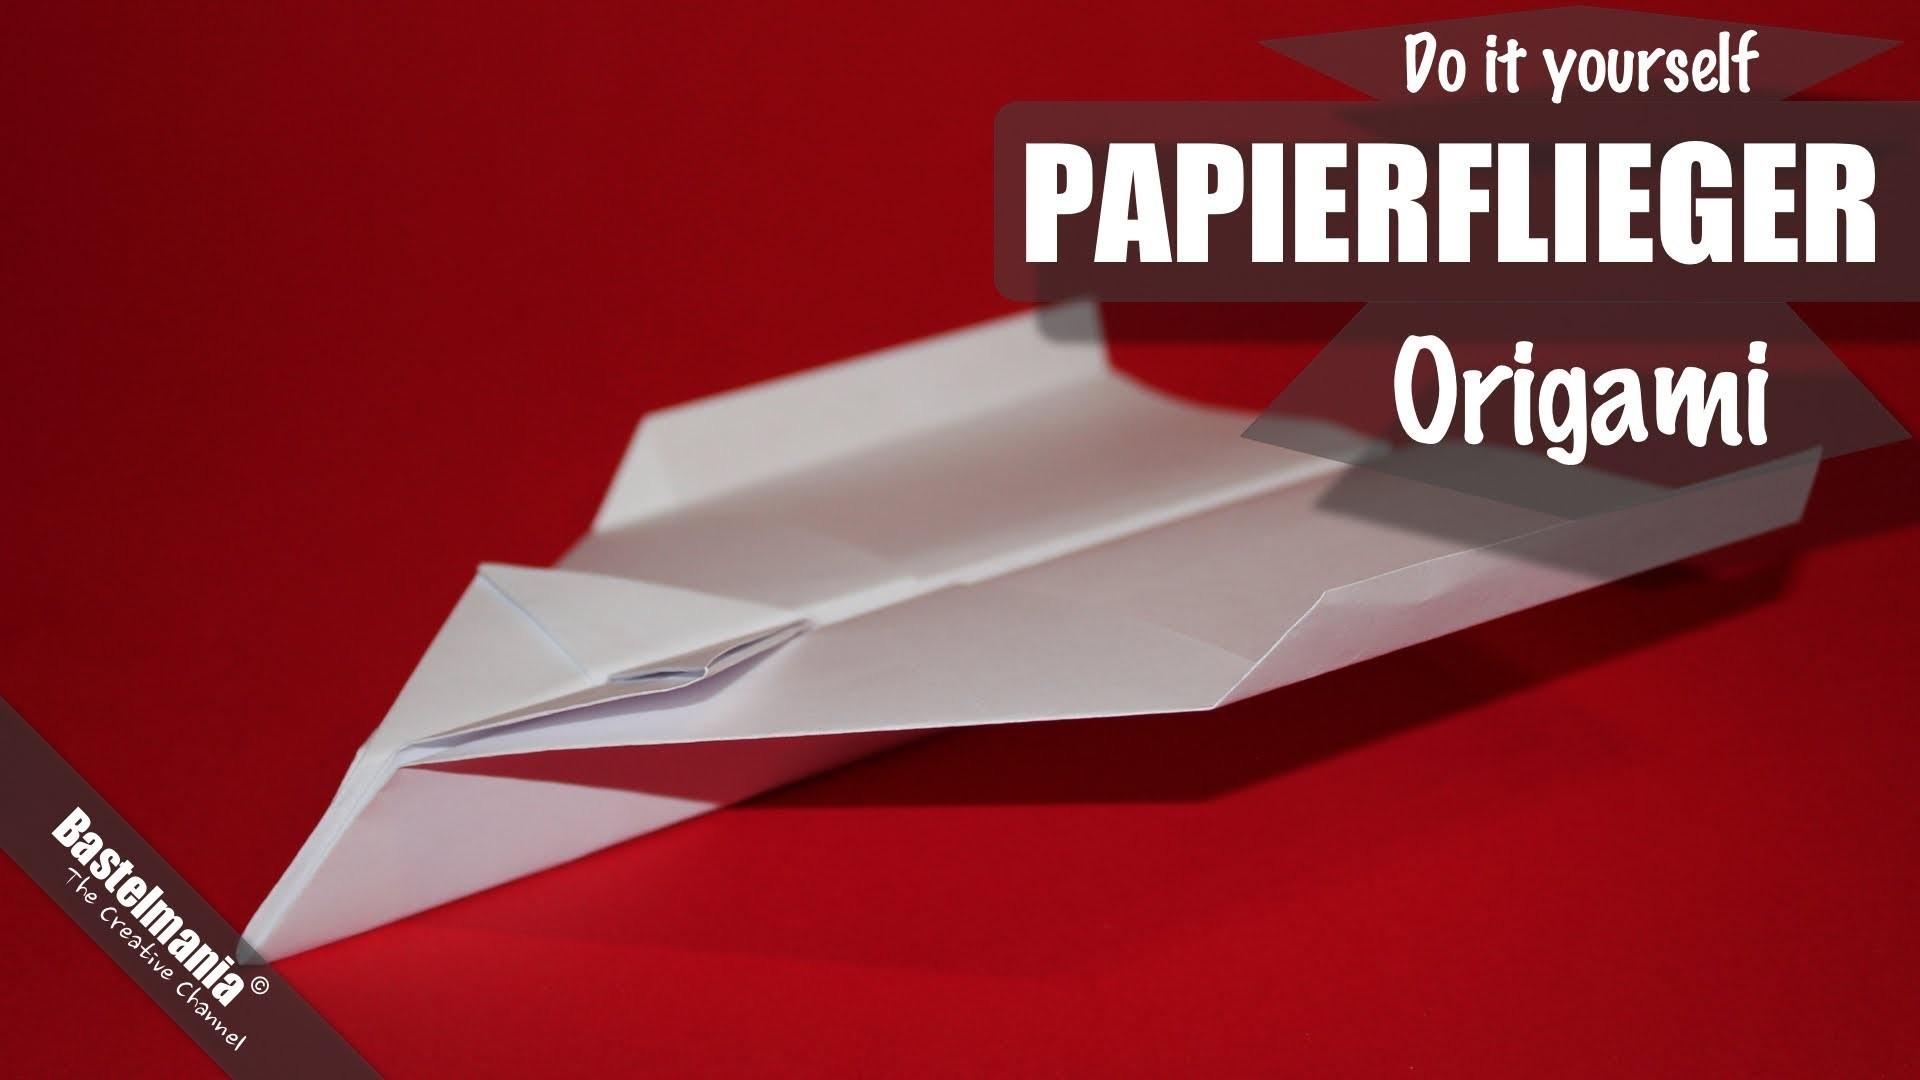 Papierflieger falten. Papierflugzeug Origami Anleitung. Paper Airplane